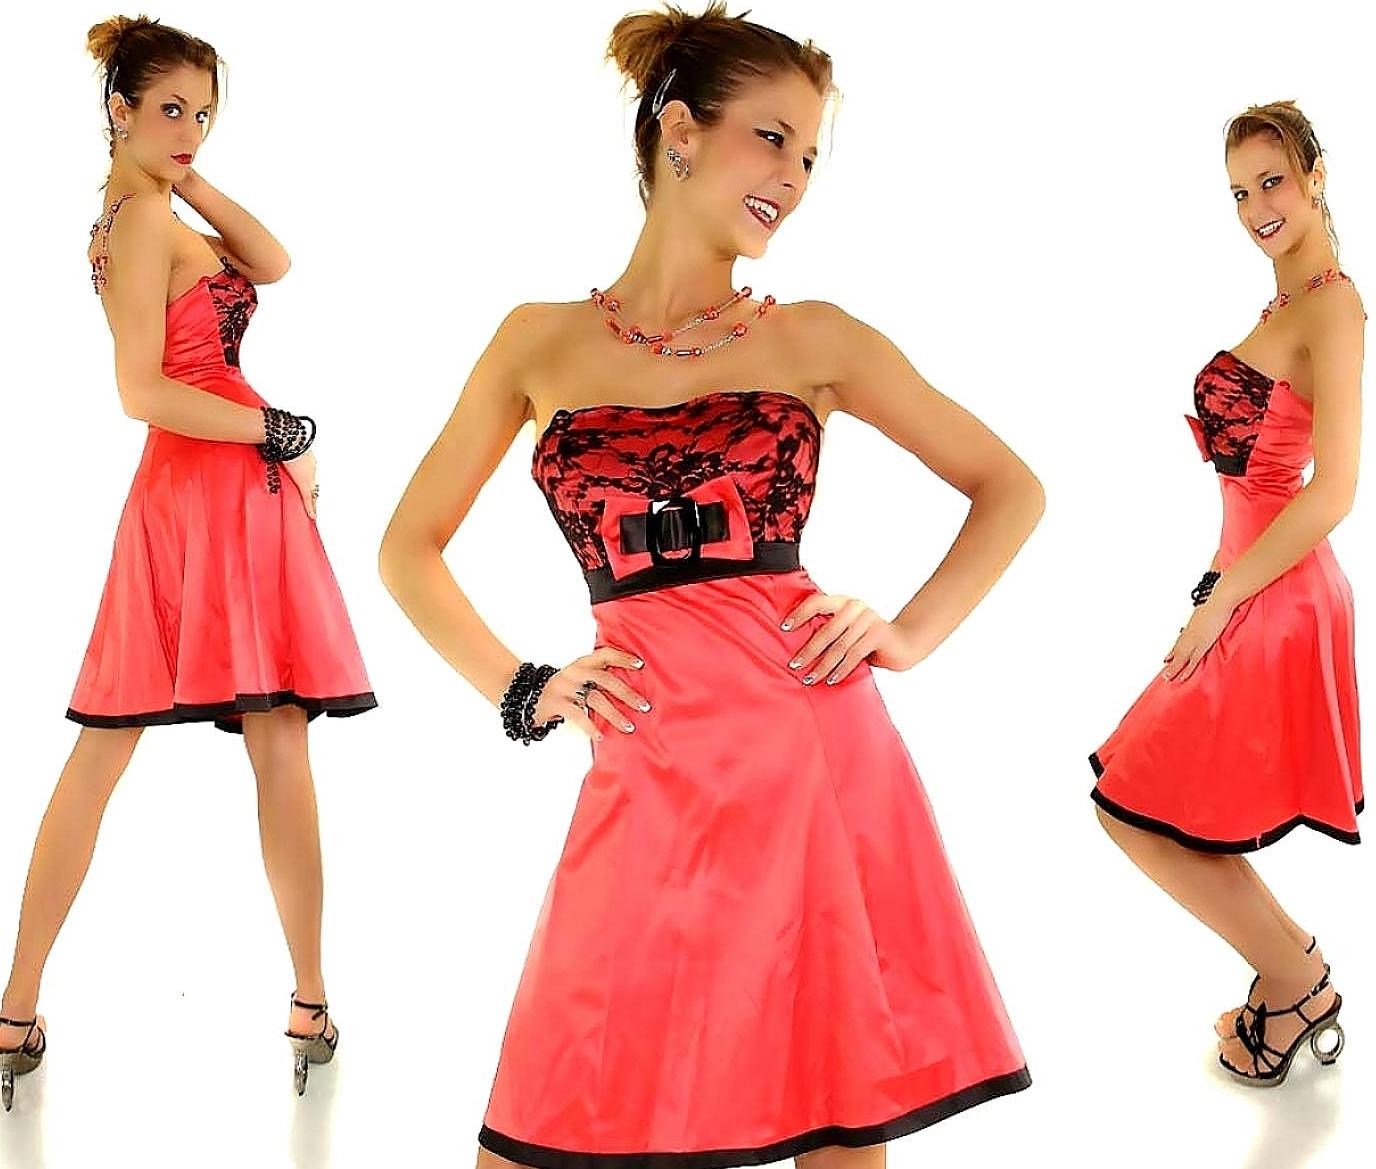 Kleid Minikleid Spitze Bandeaukleid Satin Schleife Babydoll ...